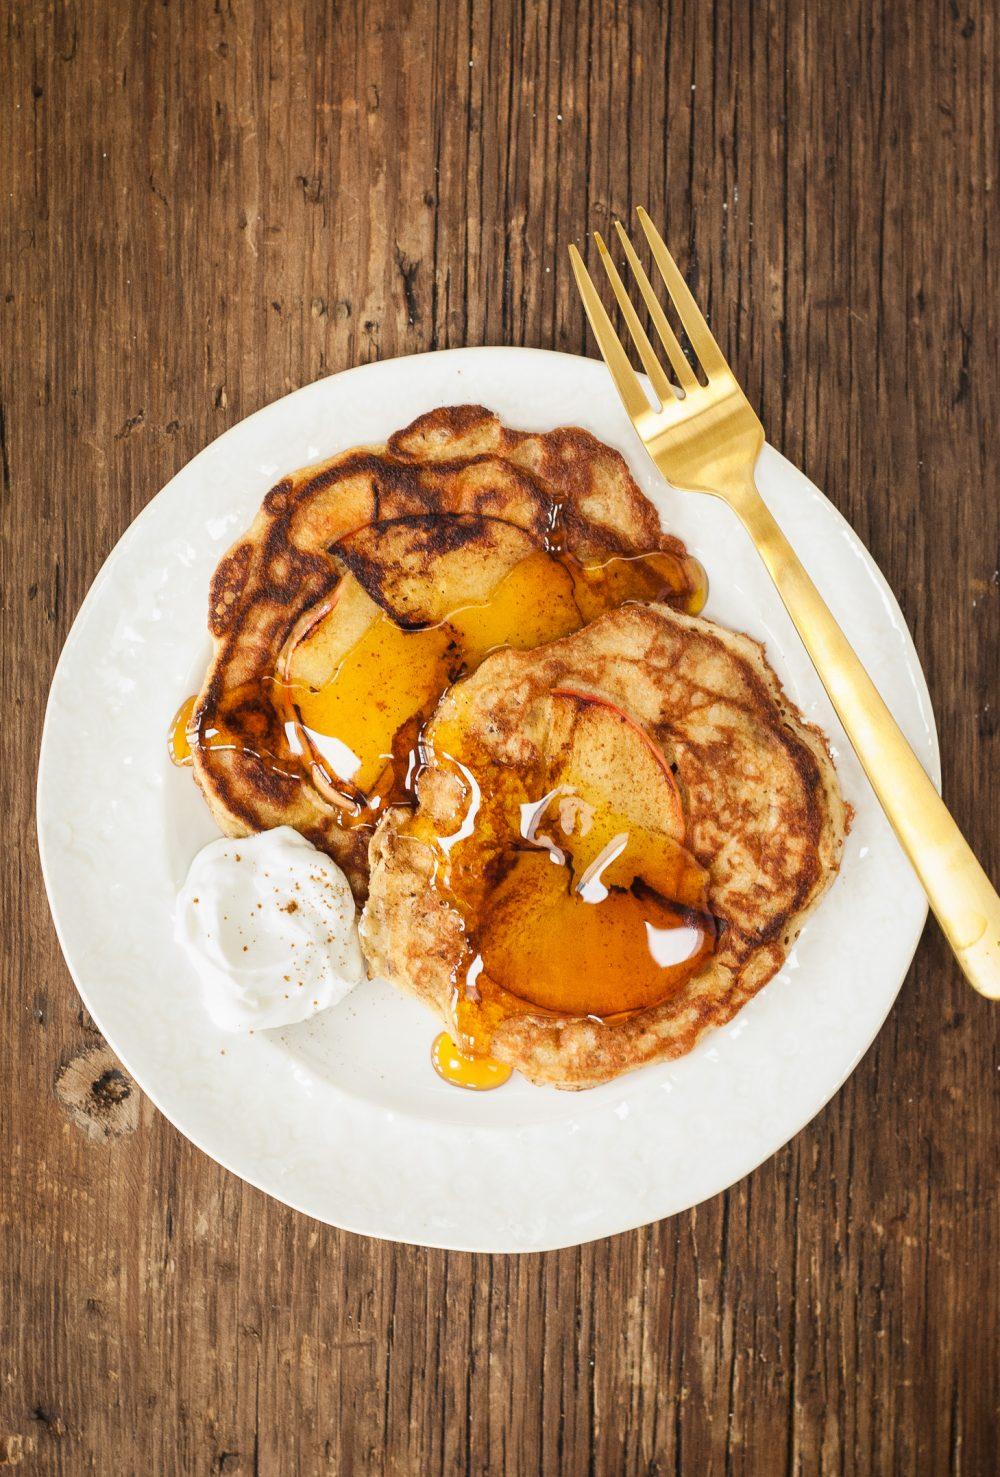 grain-free apple pie pancakes | kumquatblog.com @kumquatblog recipe